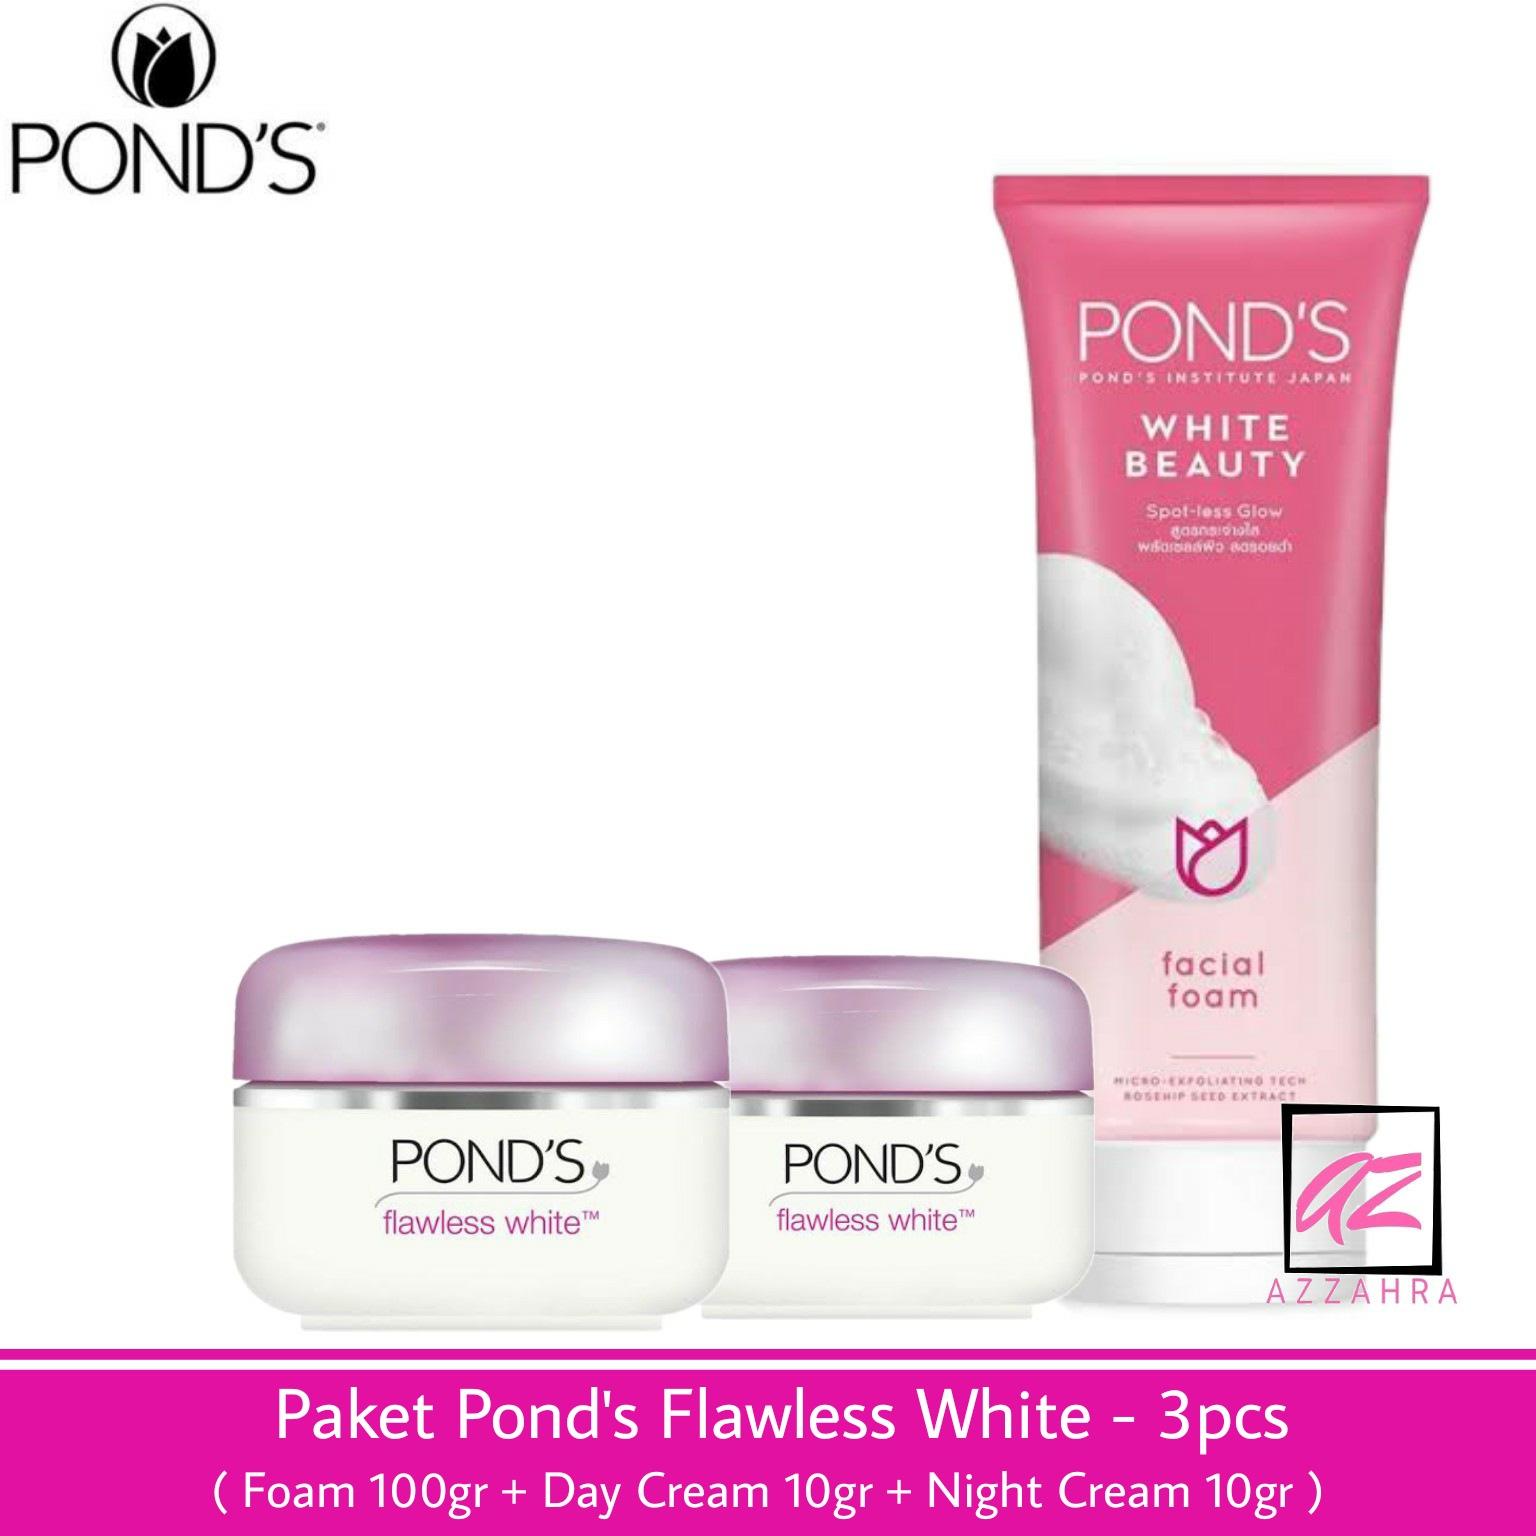 paket ponds flawless white – 3pcs ( foam 100gr + day cream 10gr + night cream 10gr )